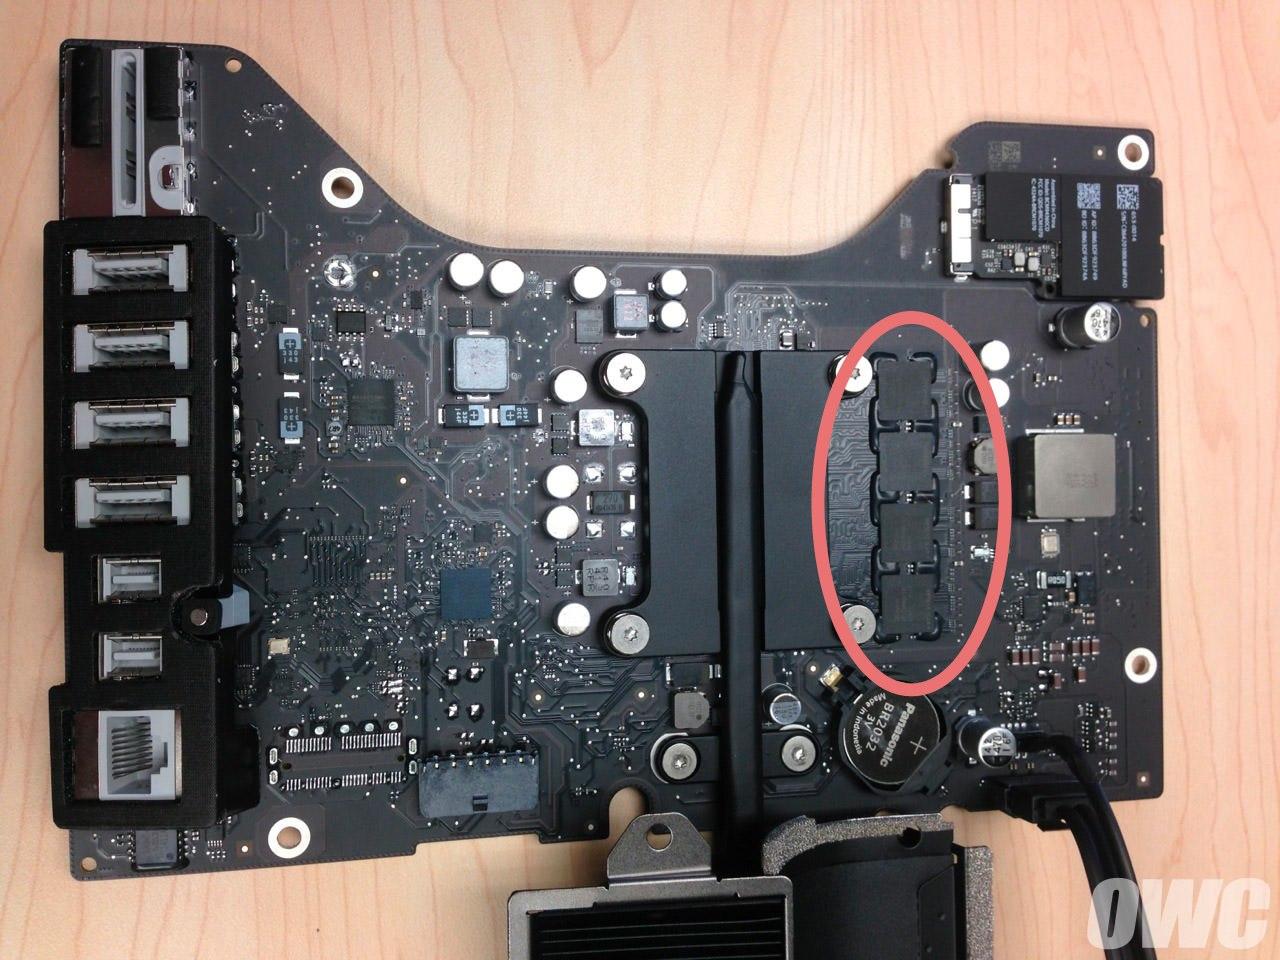 IMac21 5 2014 motherboard